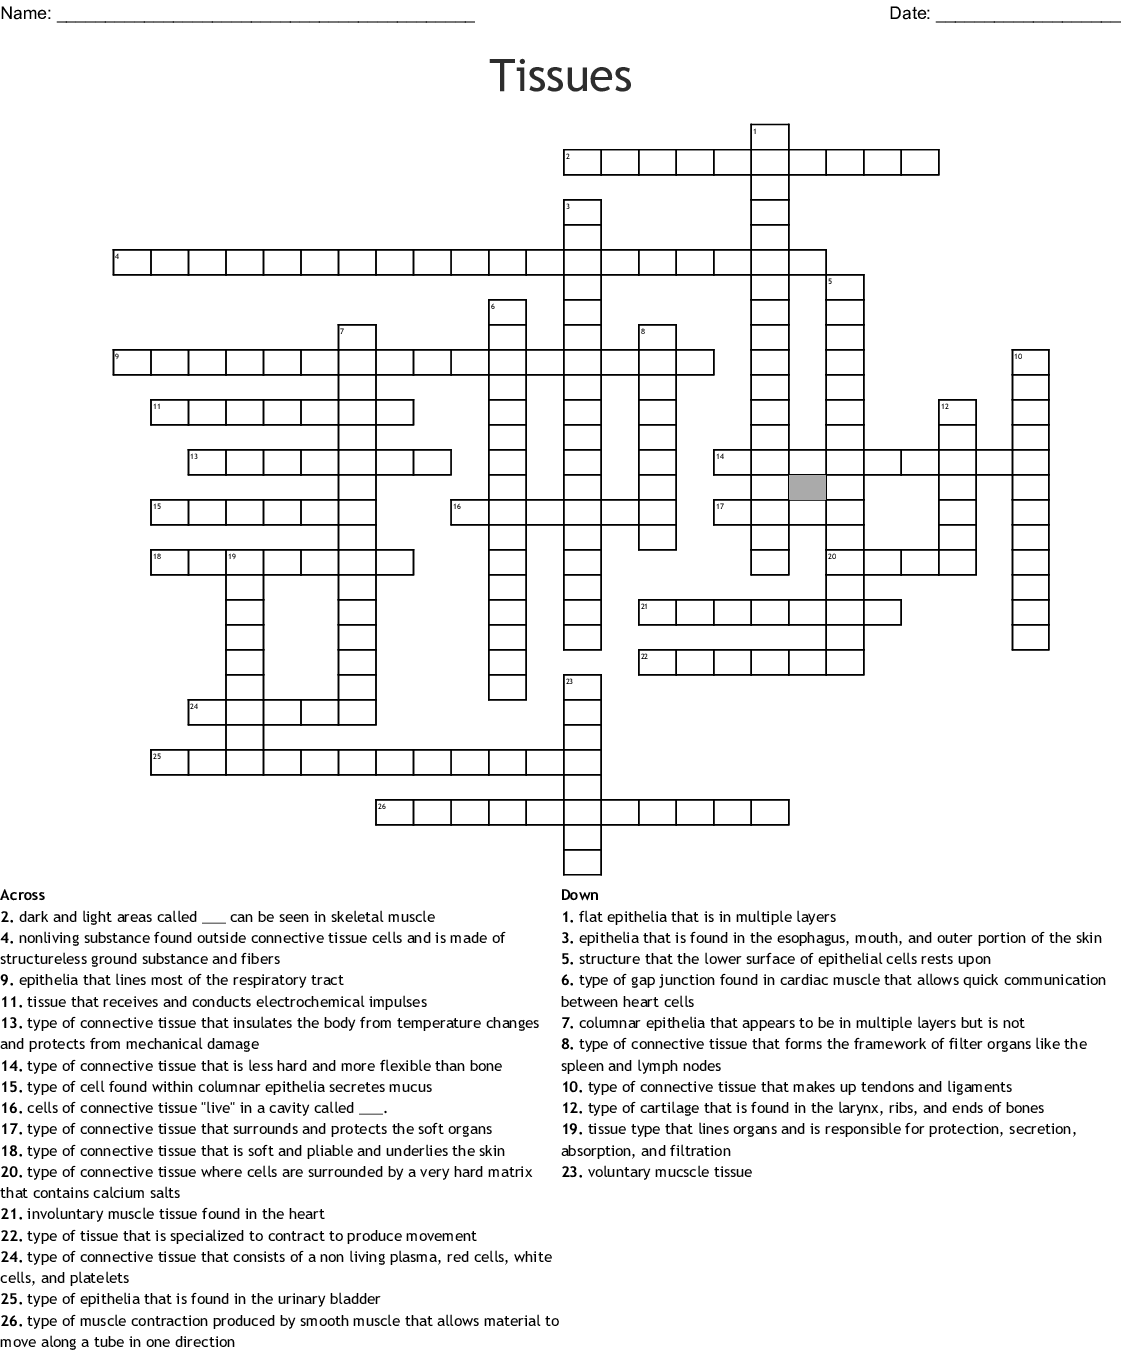 Tissues Crossword